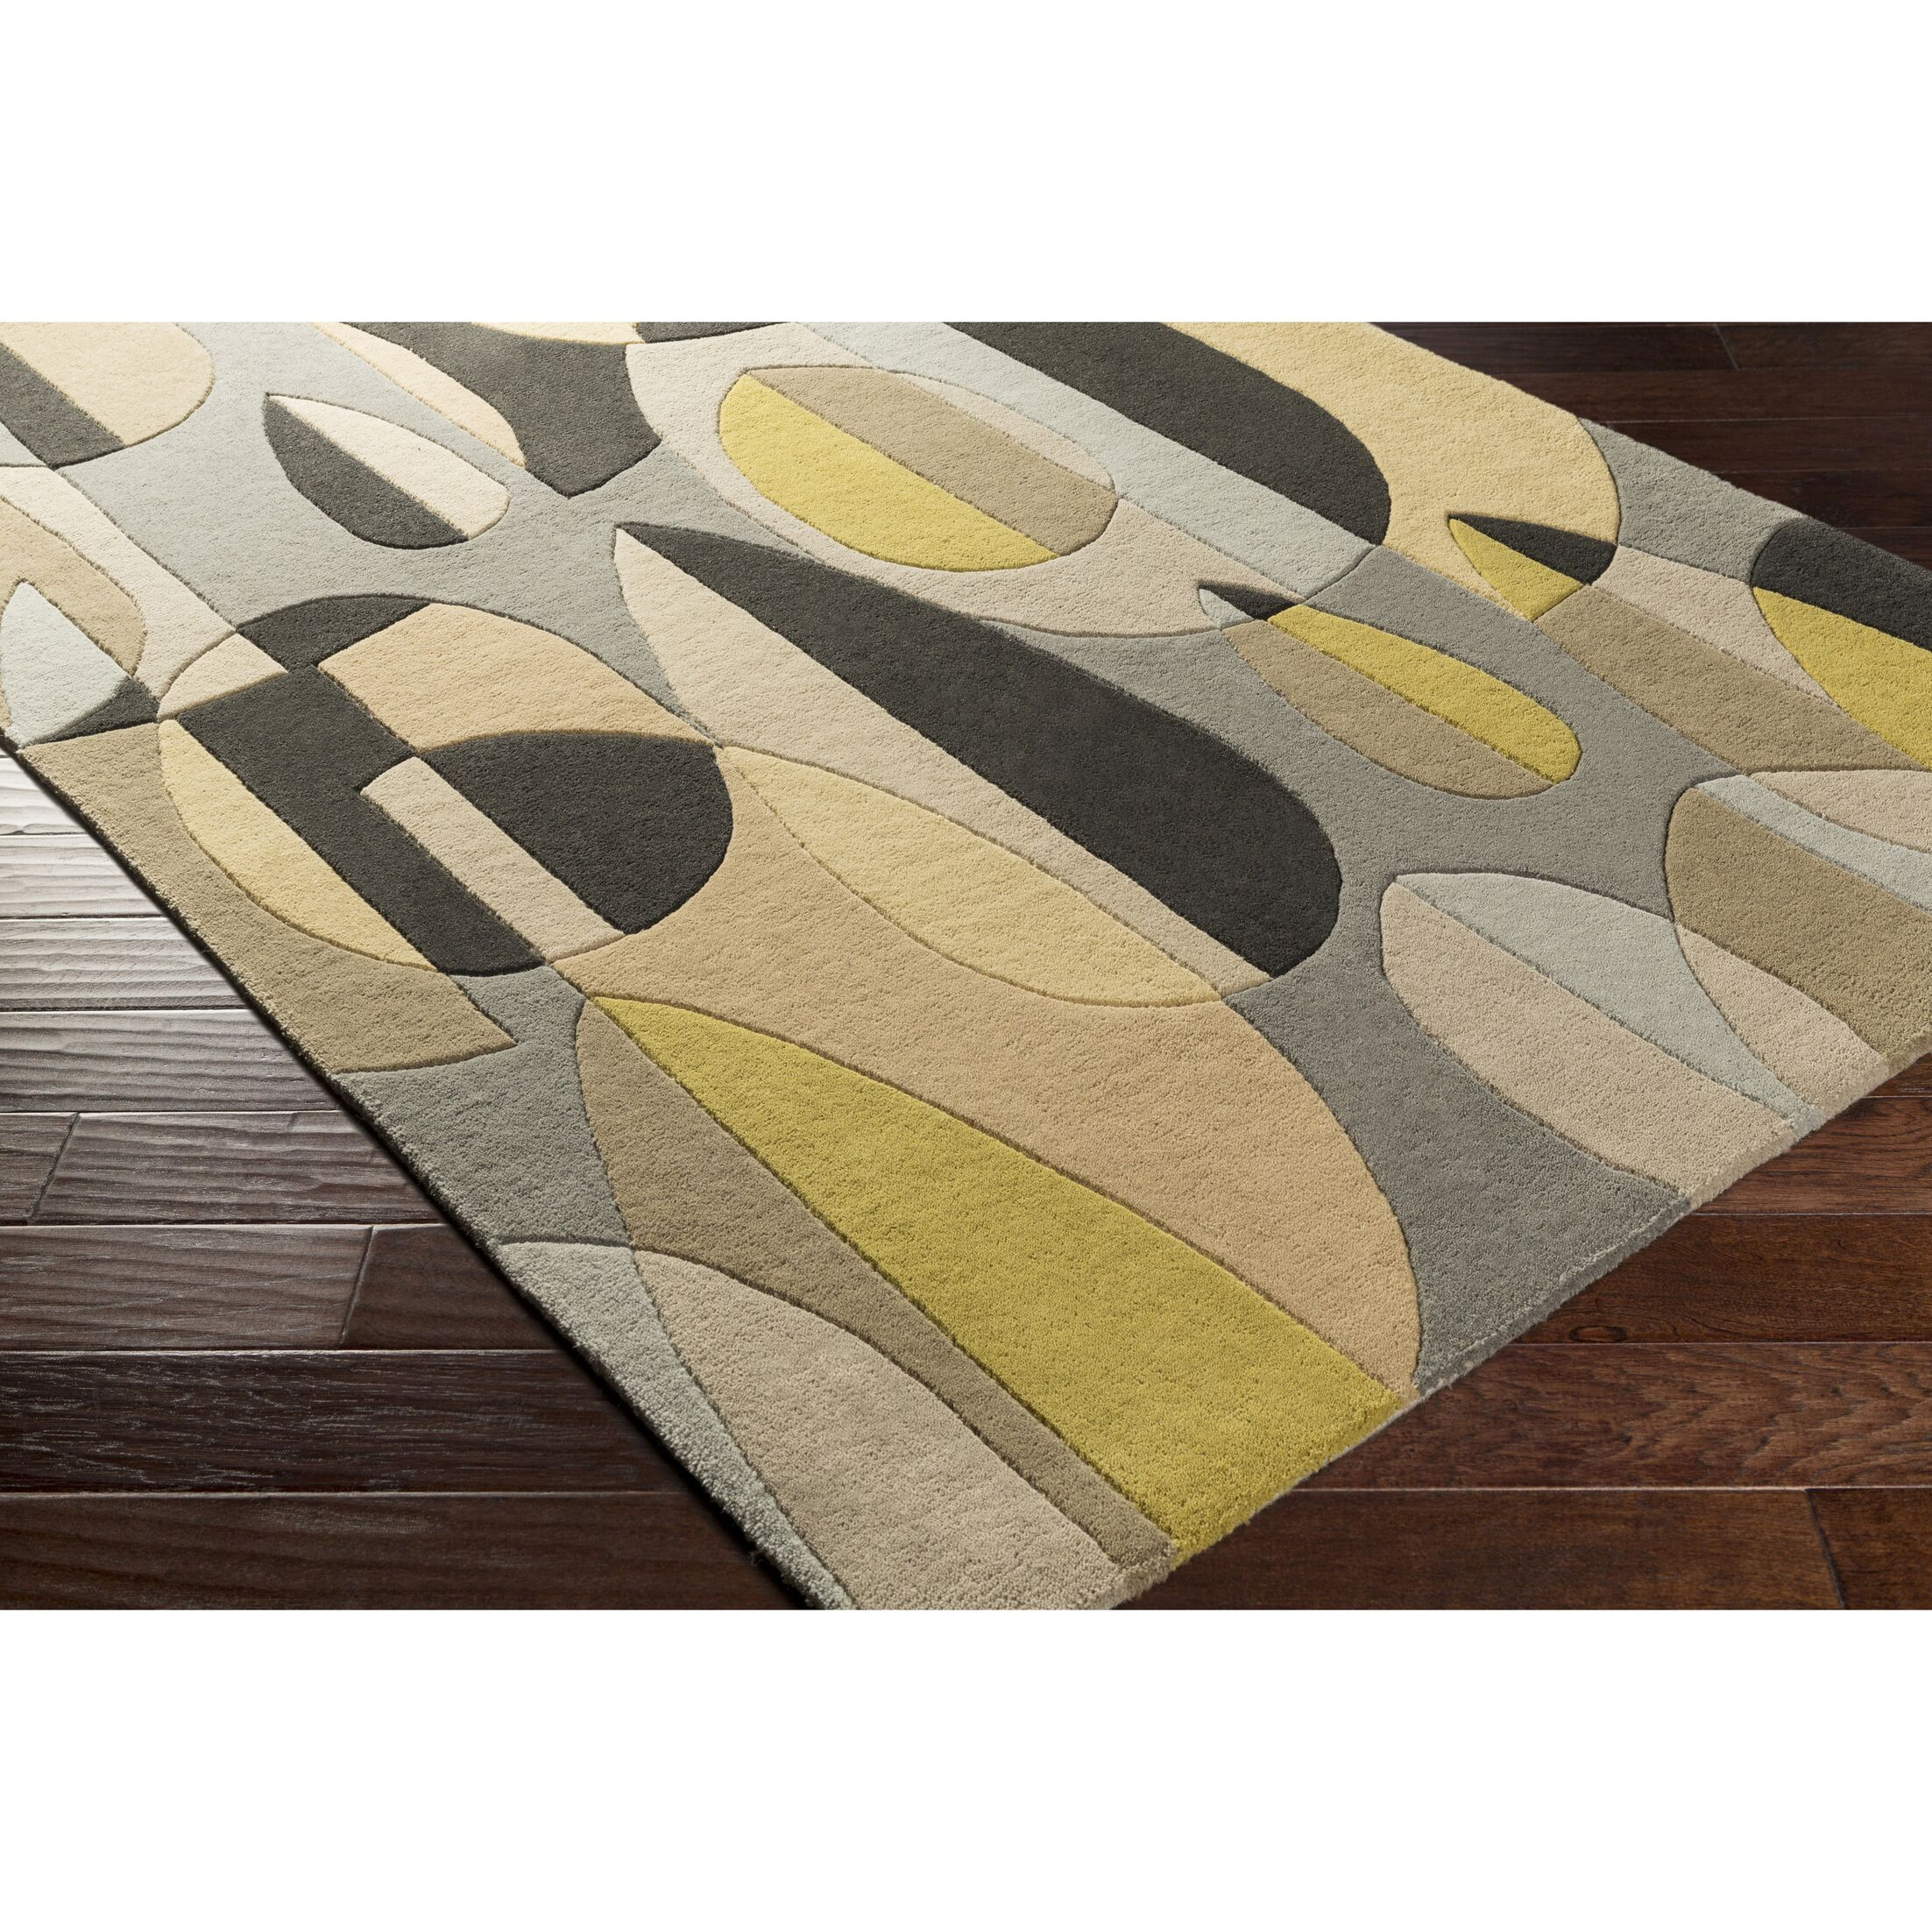 Dewald Hand-Tufted Black/Brown Area Rug Rug Size: Rectangle 5' x 8'